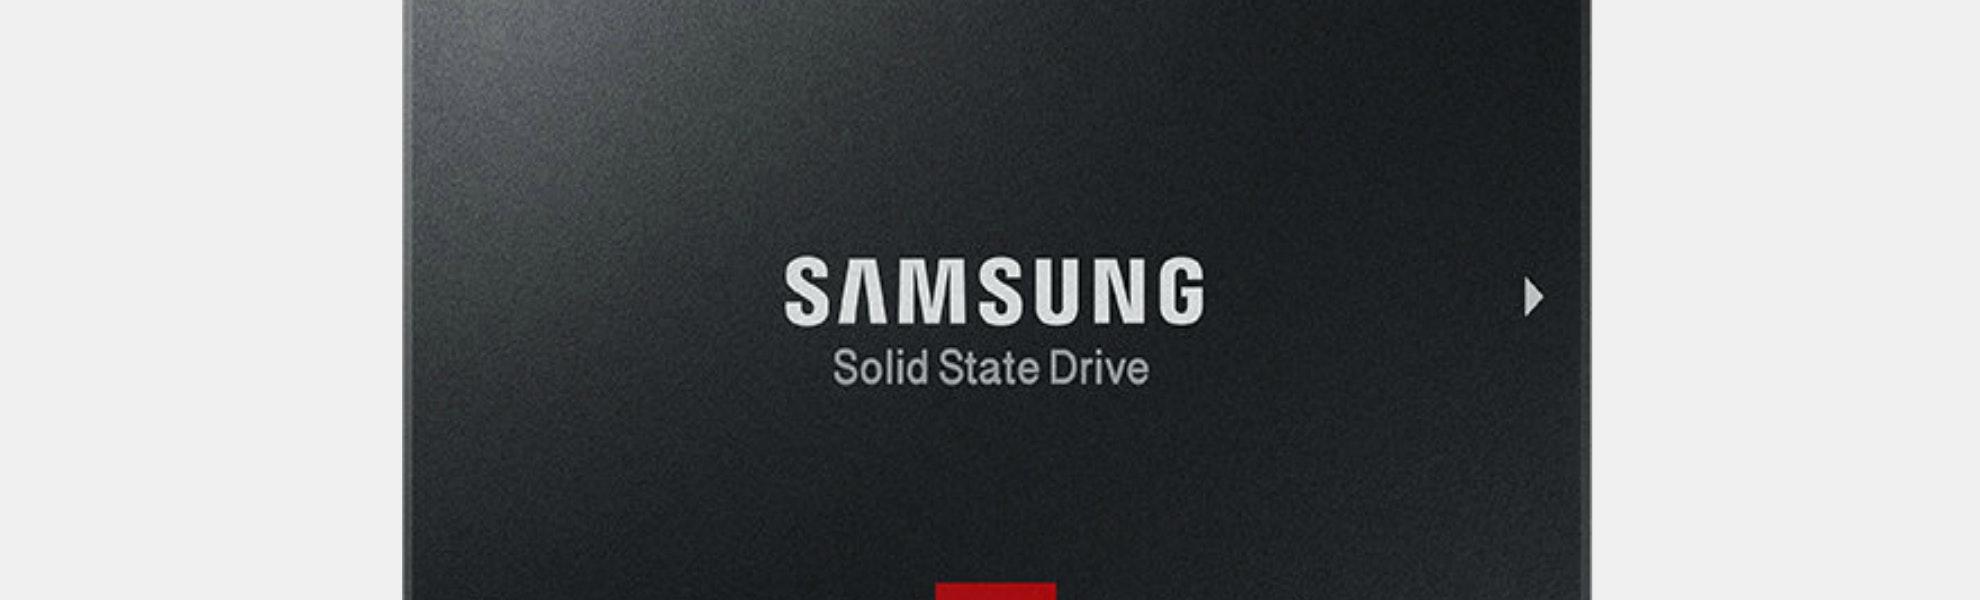 "Samsung 860 PRO 2.5"" SATA III Internal SSD Drives"